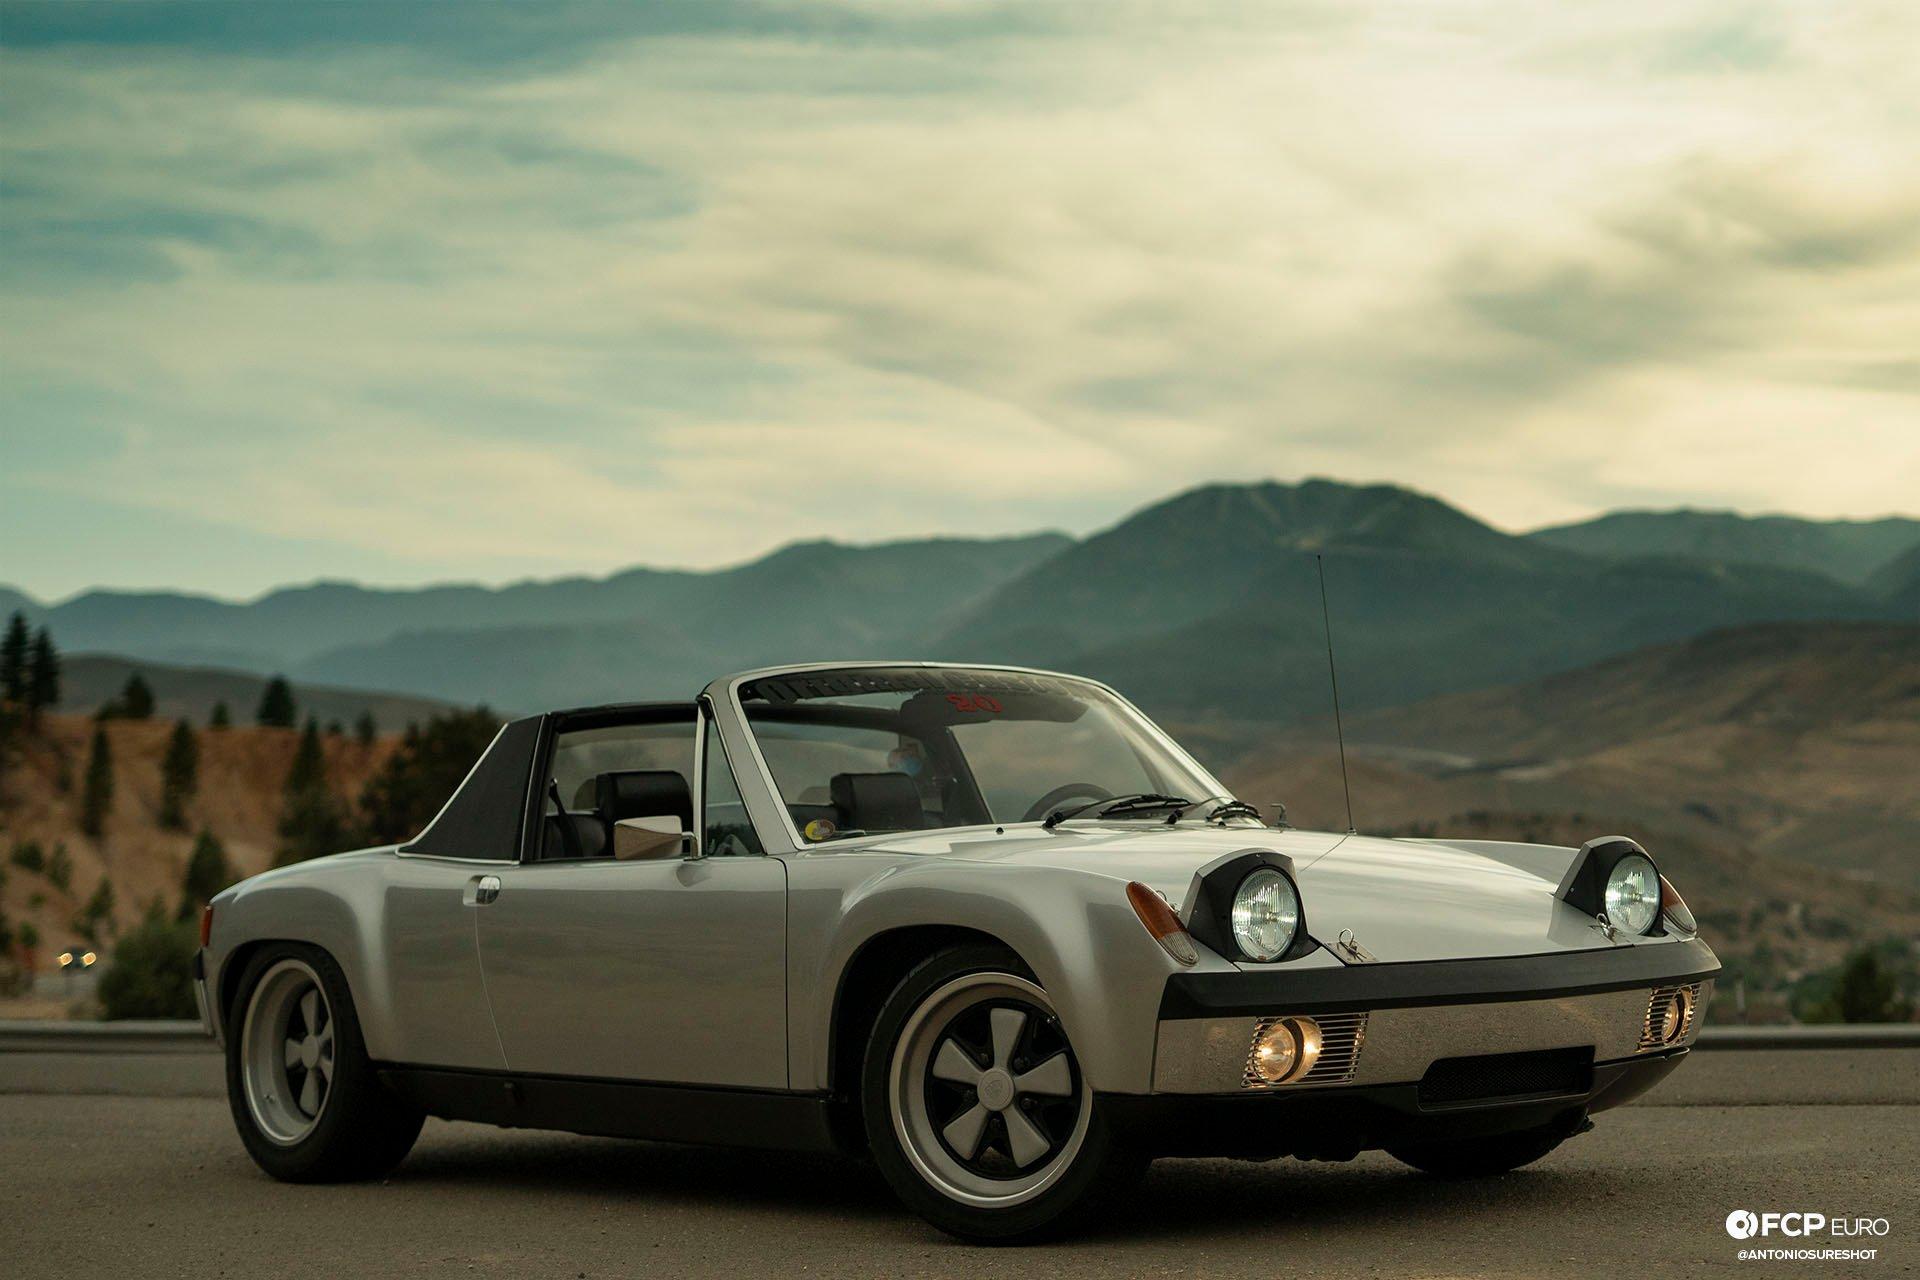 1975 Porsche 914-6 Fuchs